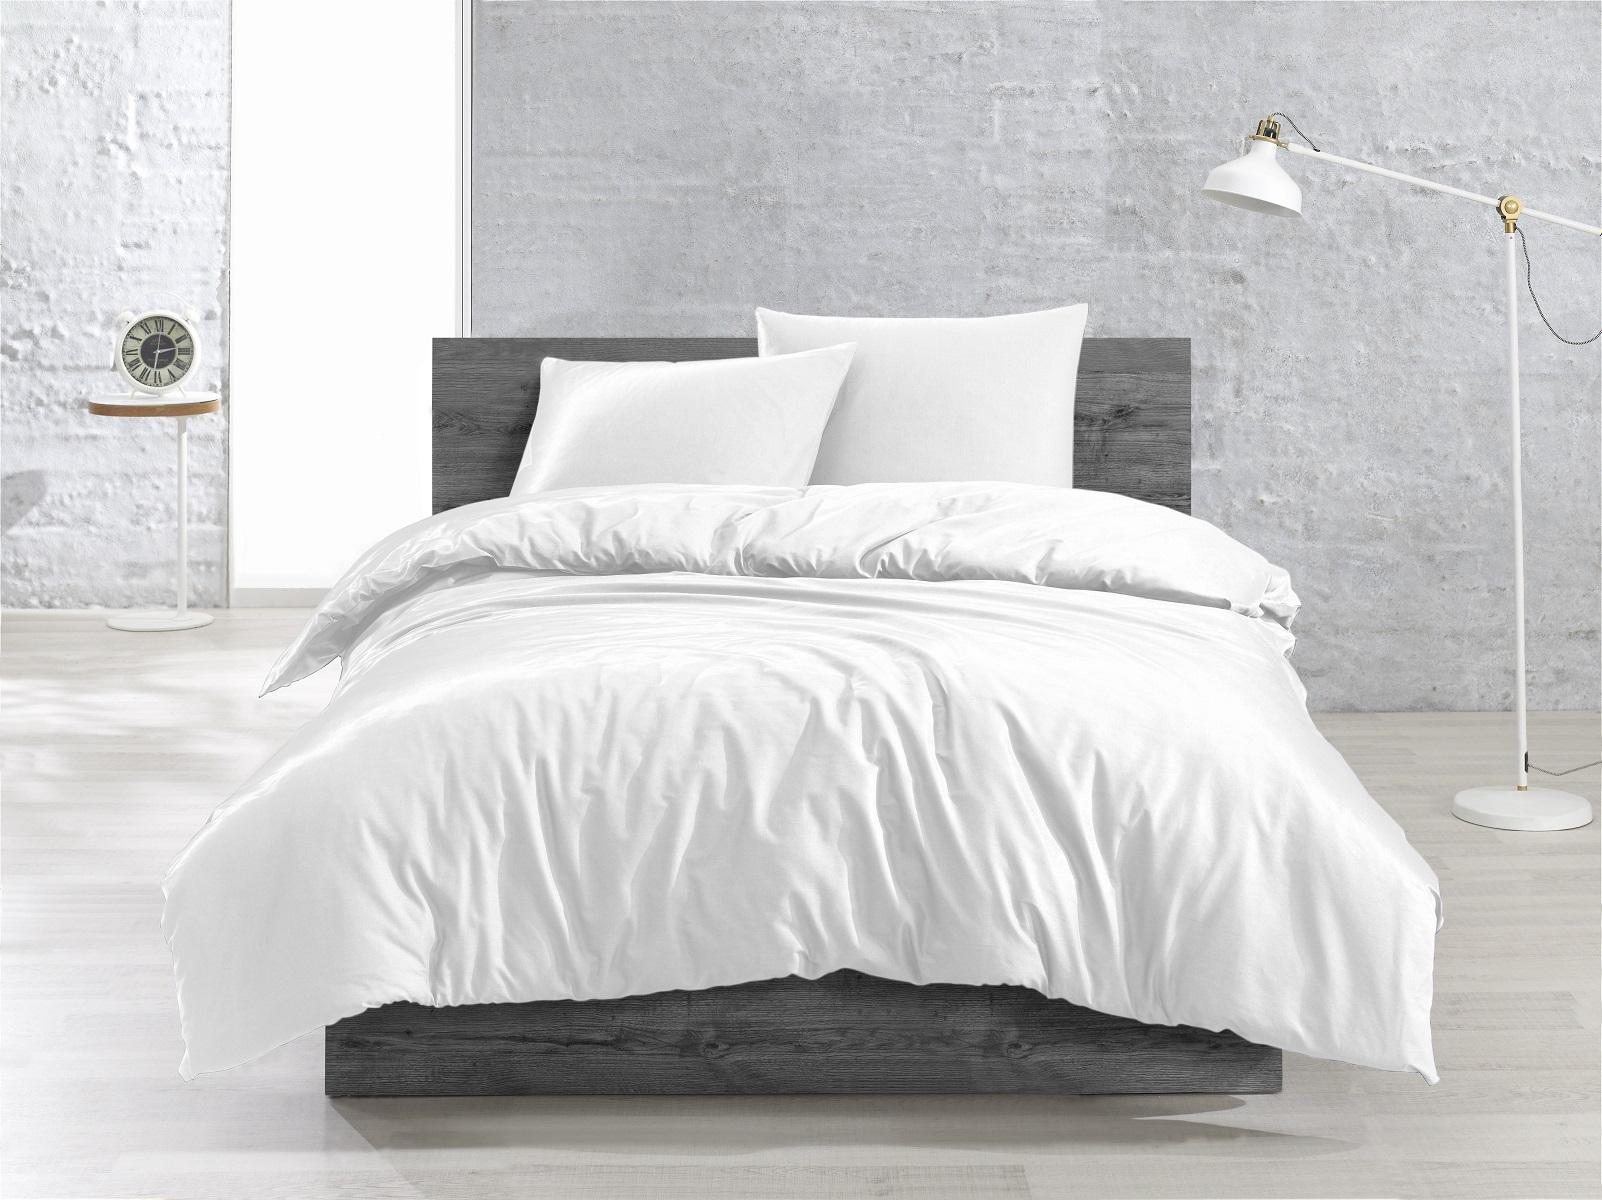 3 tlg renforce bettw sche bettgarnitur 200x200 cm i. Black Bedroom Furniture Sets. Home Design Ideas